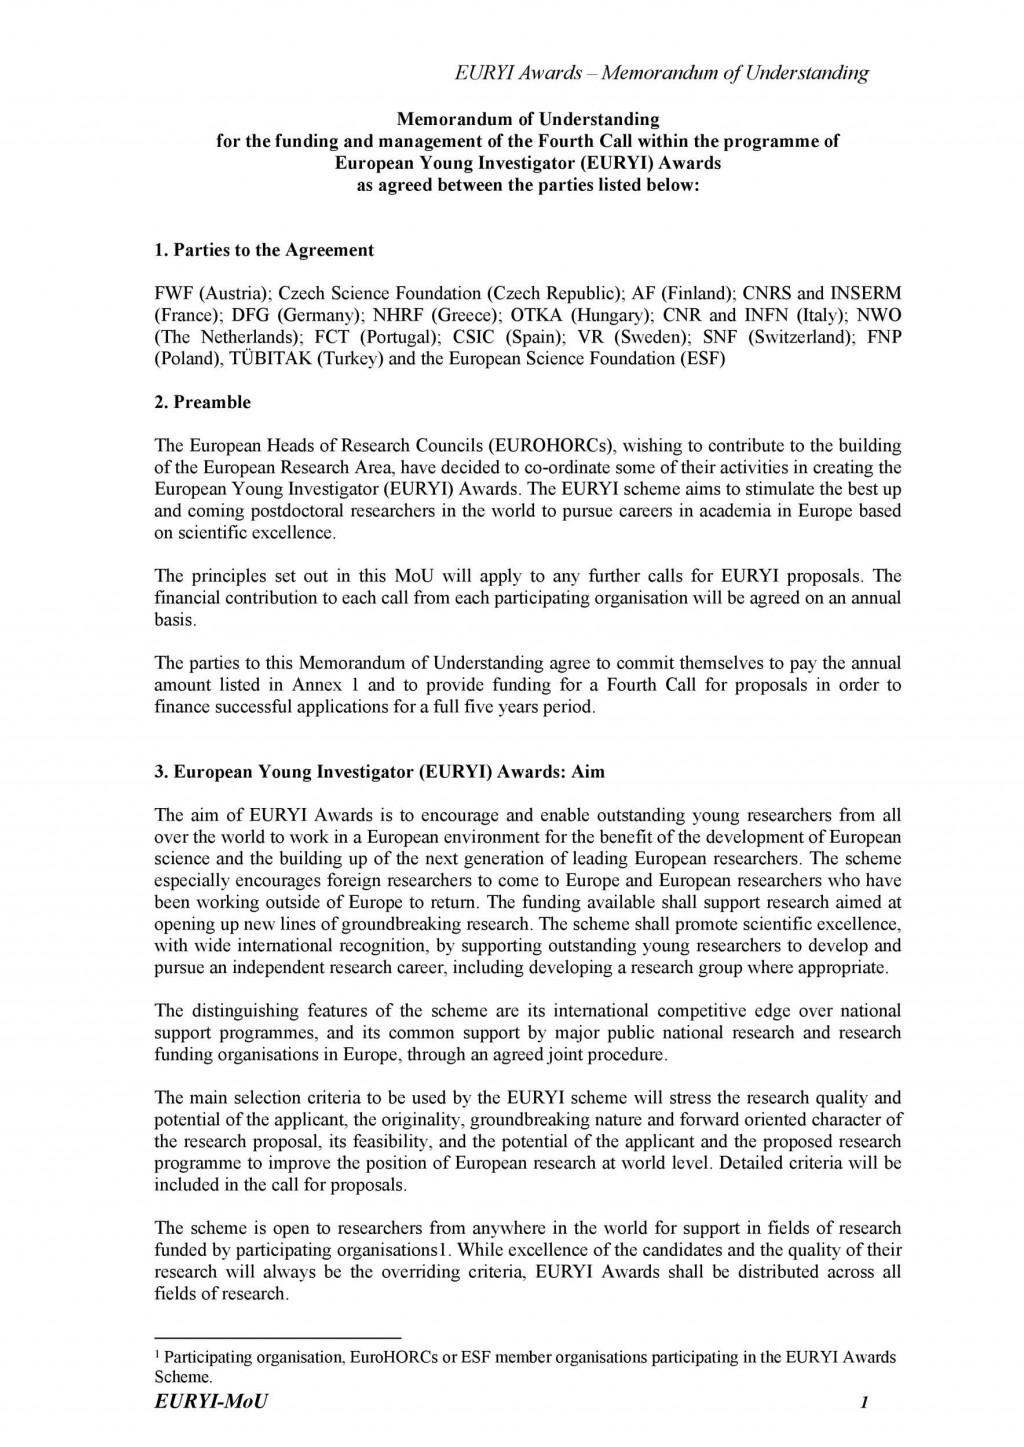 002 Unique Letter Of Understanding Format Design  Sample MemorandumLarge